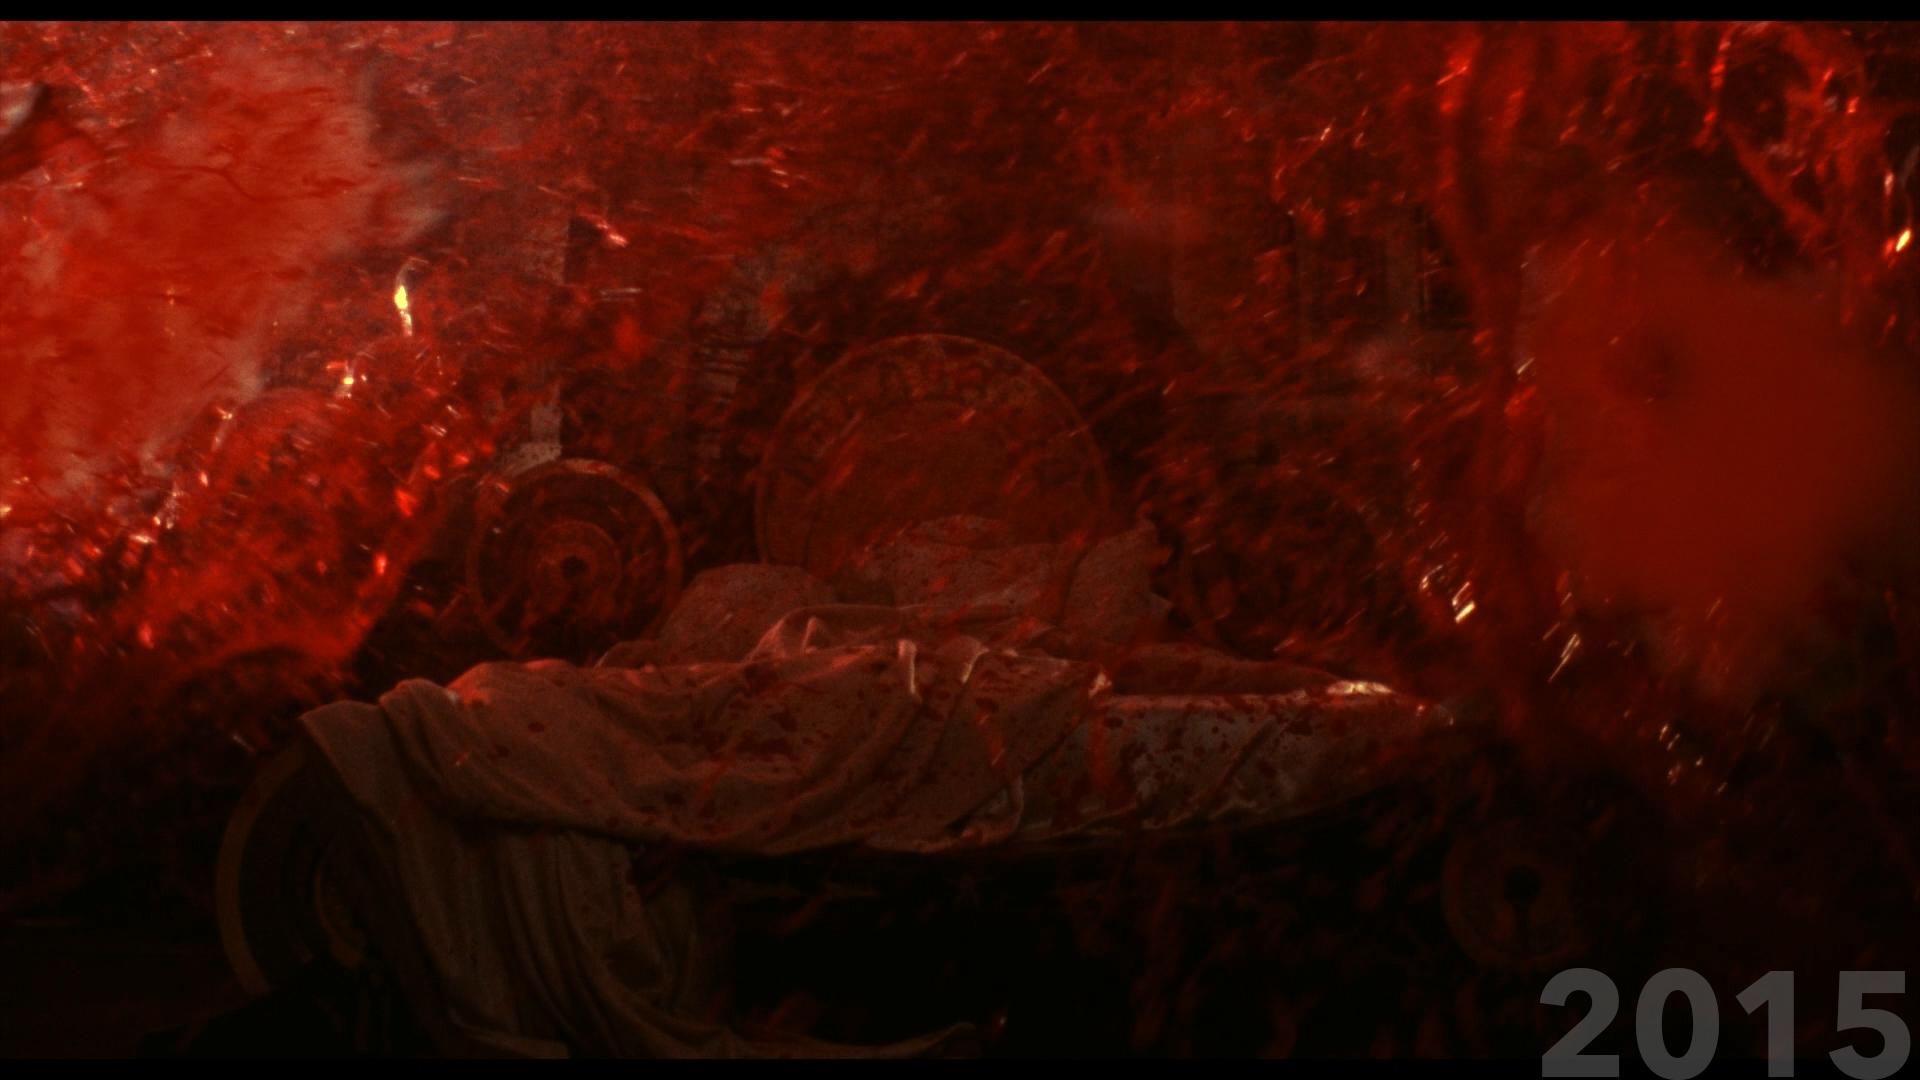 Bram Stoker's Dracula bloodbath 2015